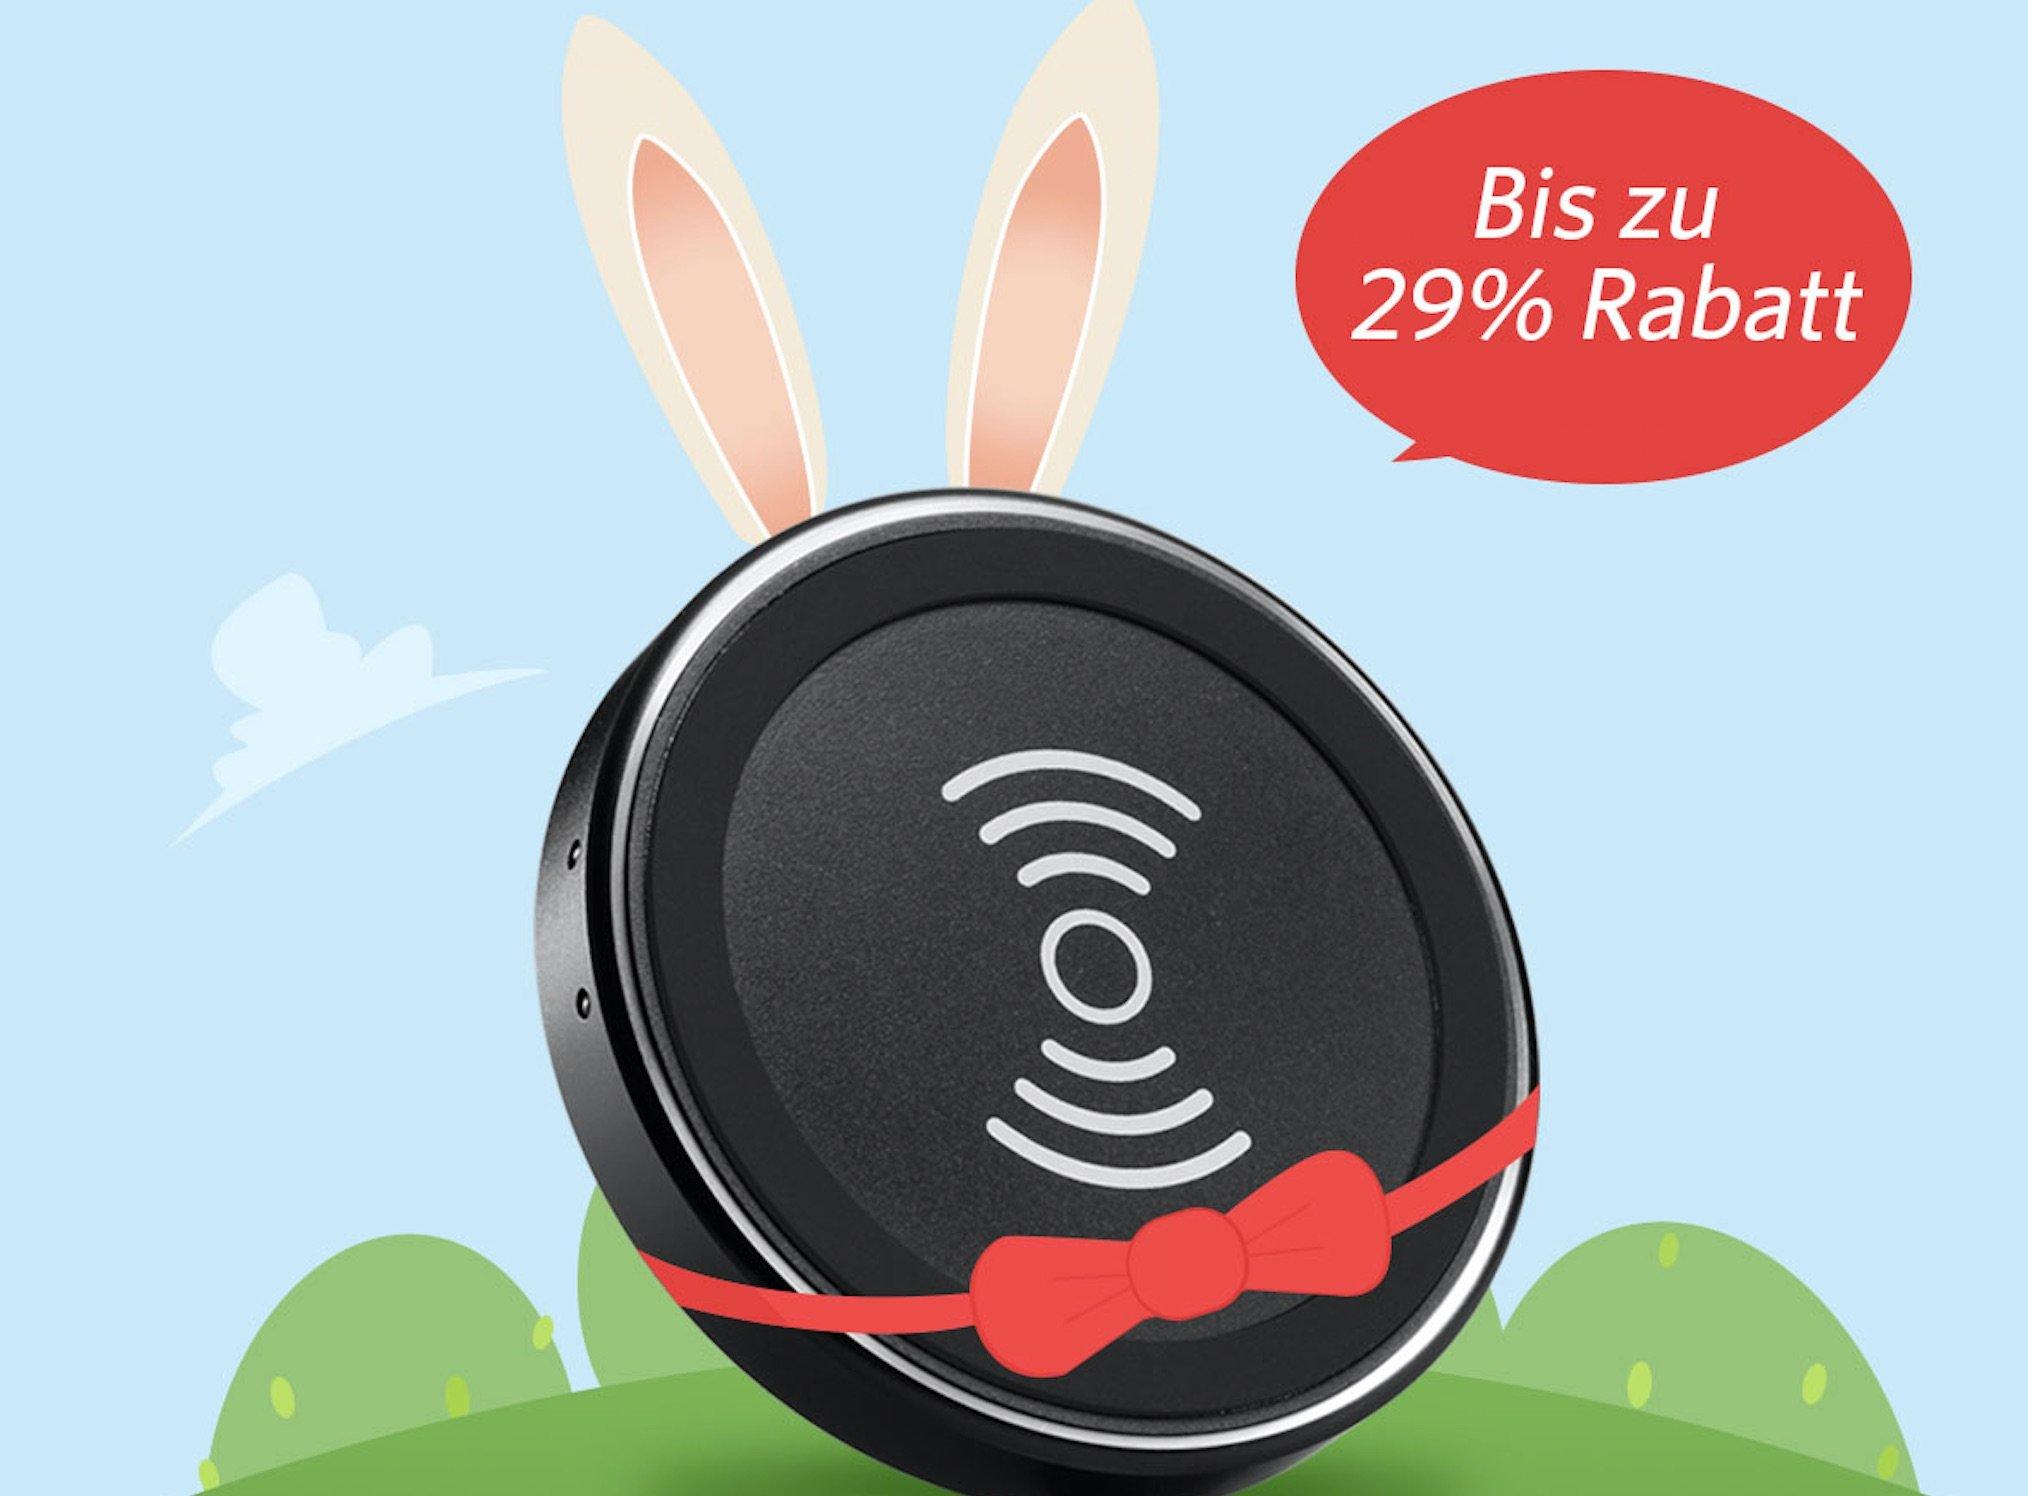 Anker & Eufy: bis zu 29% Rabatt für Wireless Charging, Akkus, Ladegeräte, Waagen & Co. 1